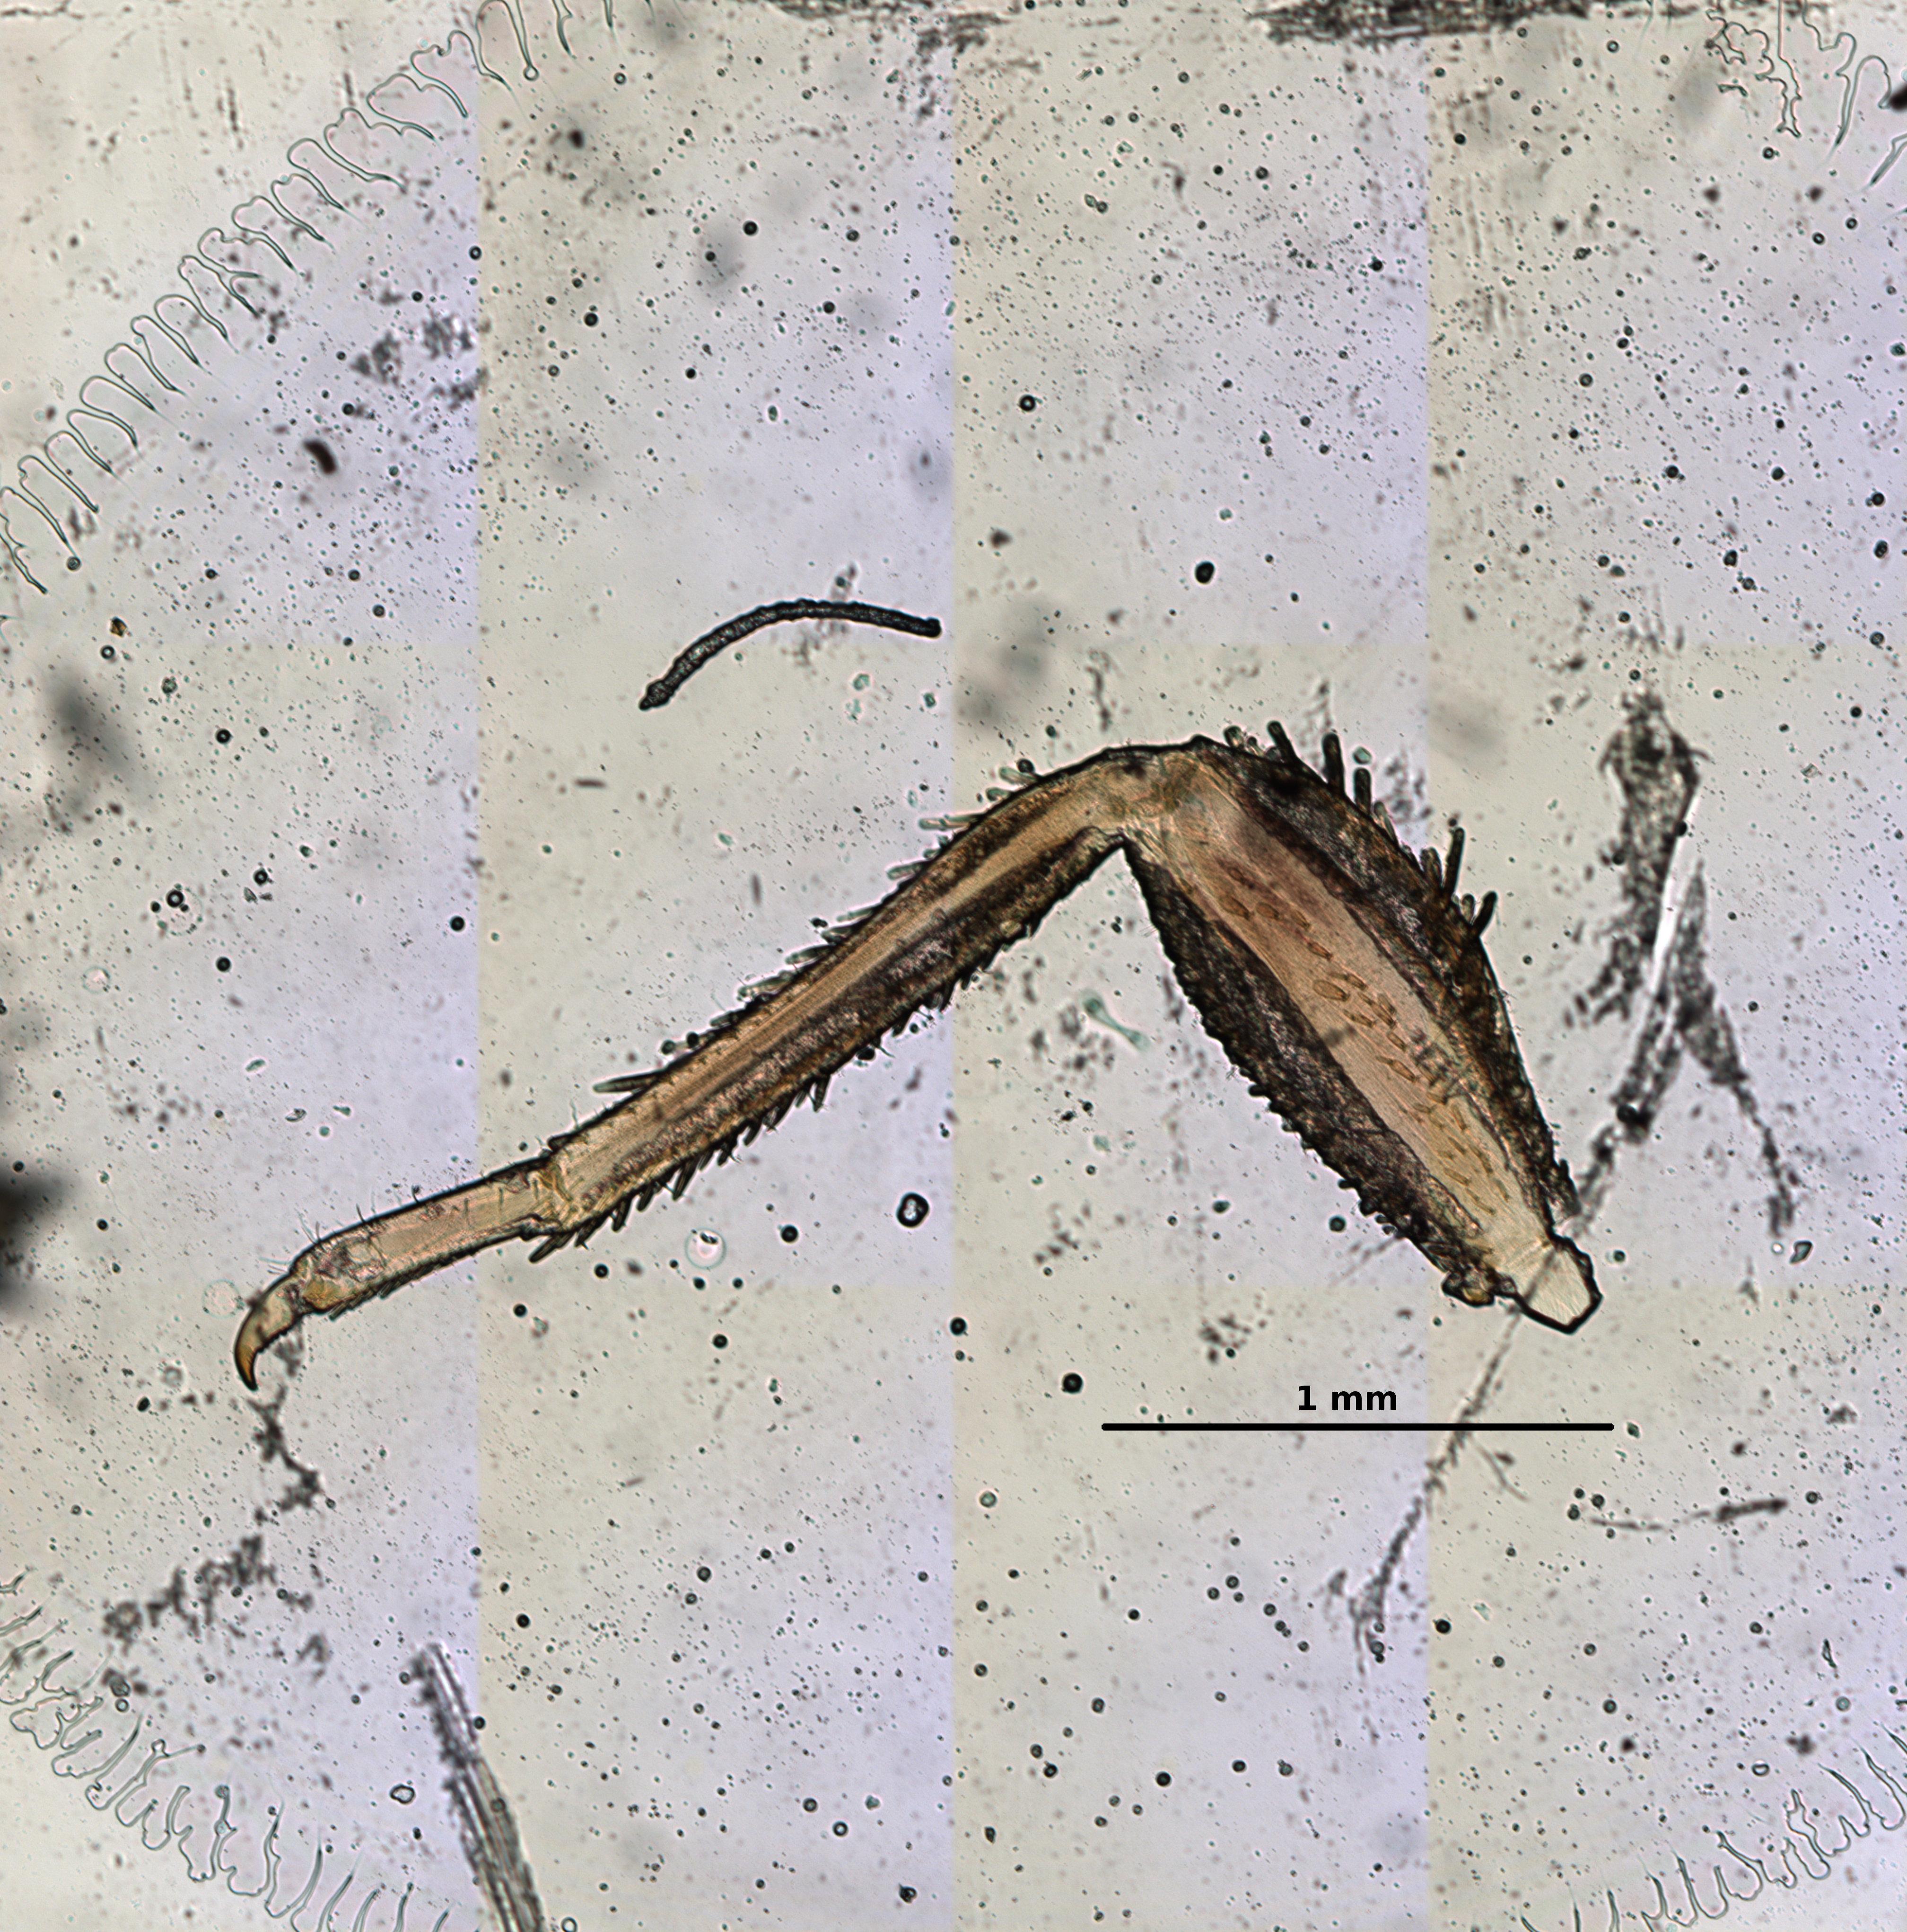 Ephemerythus (Tricomerella) straeleni s4 leg 3 5x.jpg